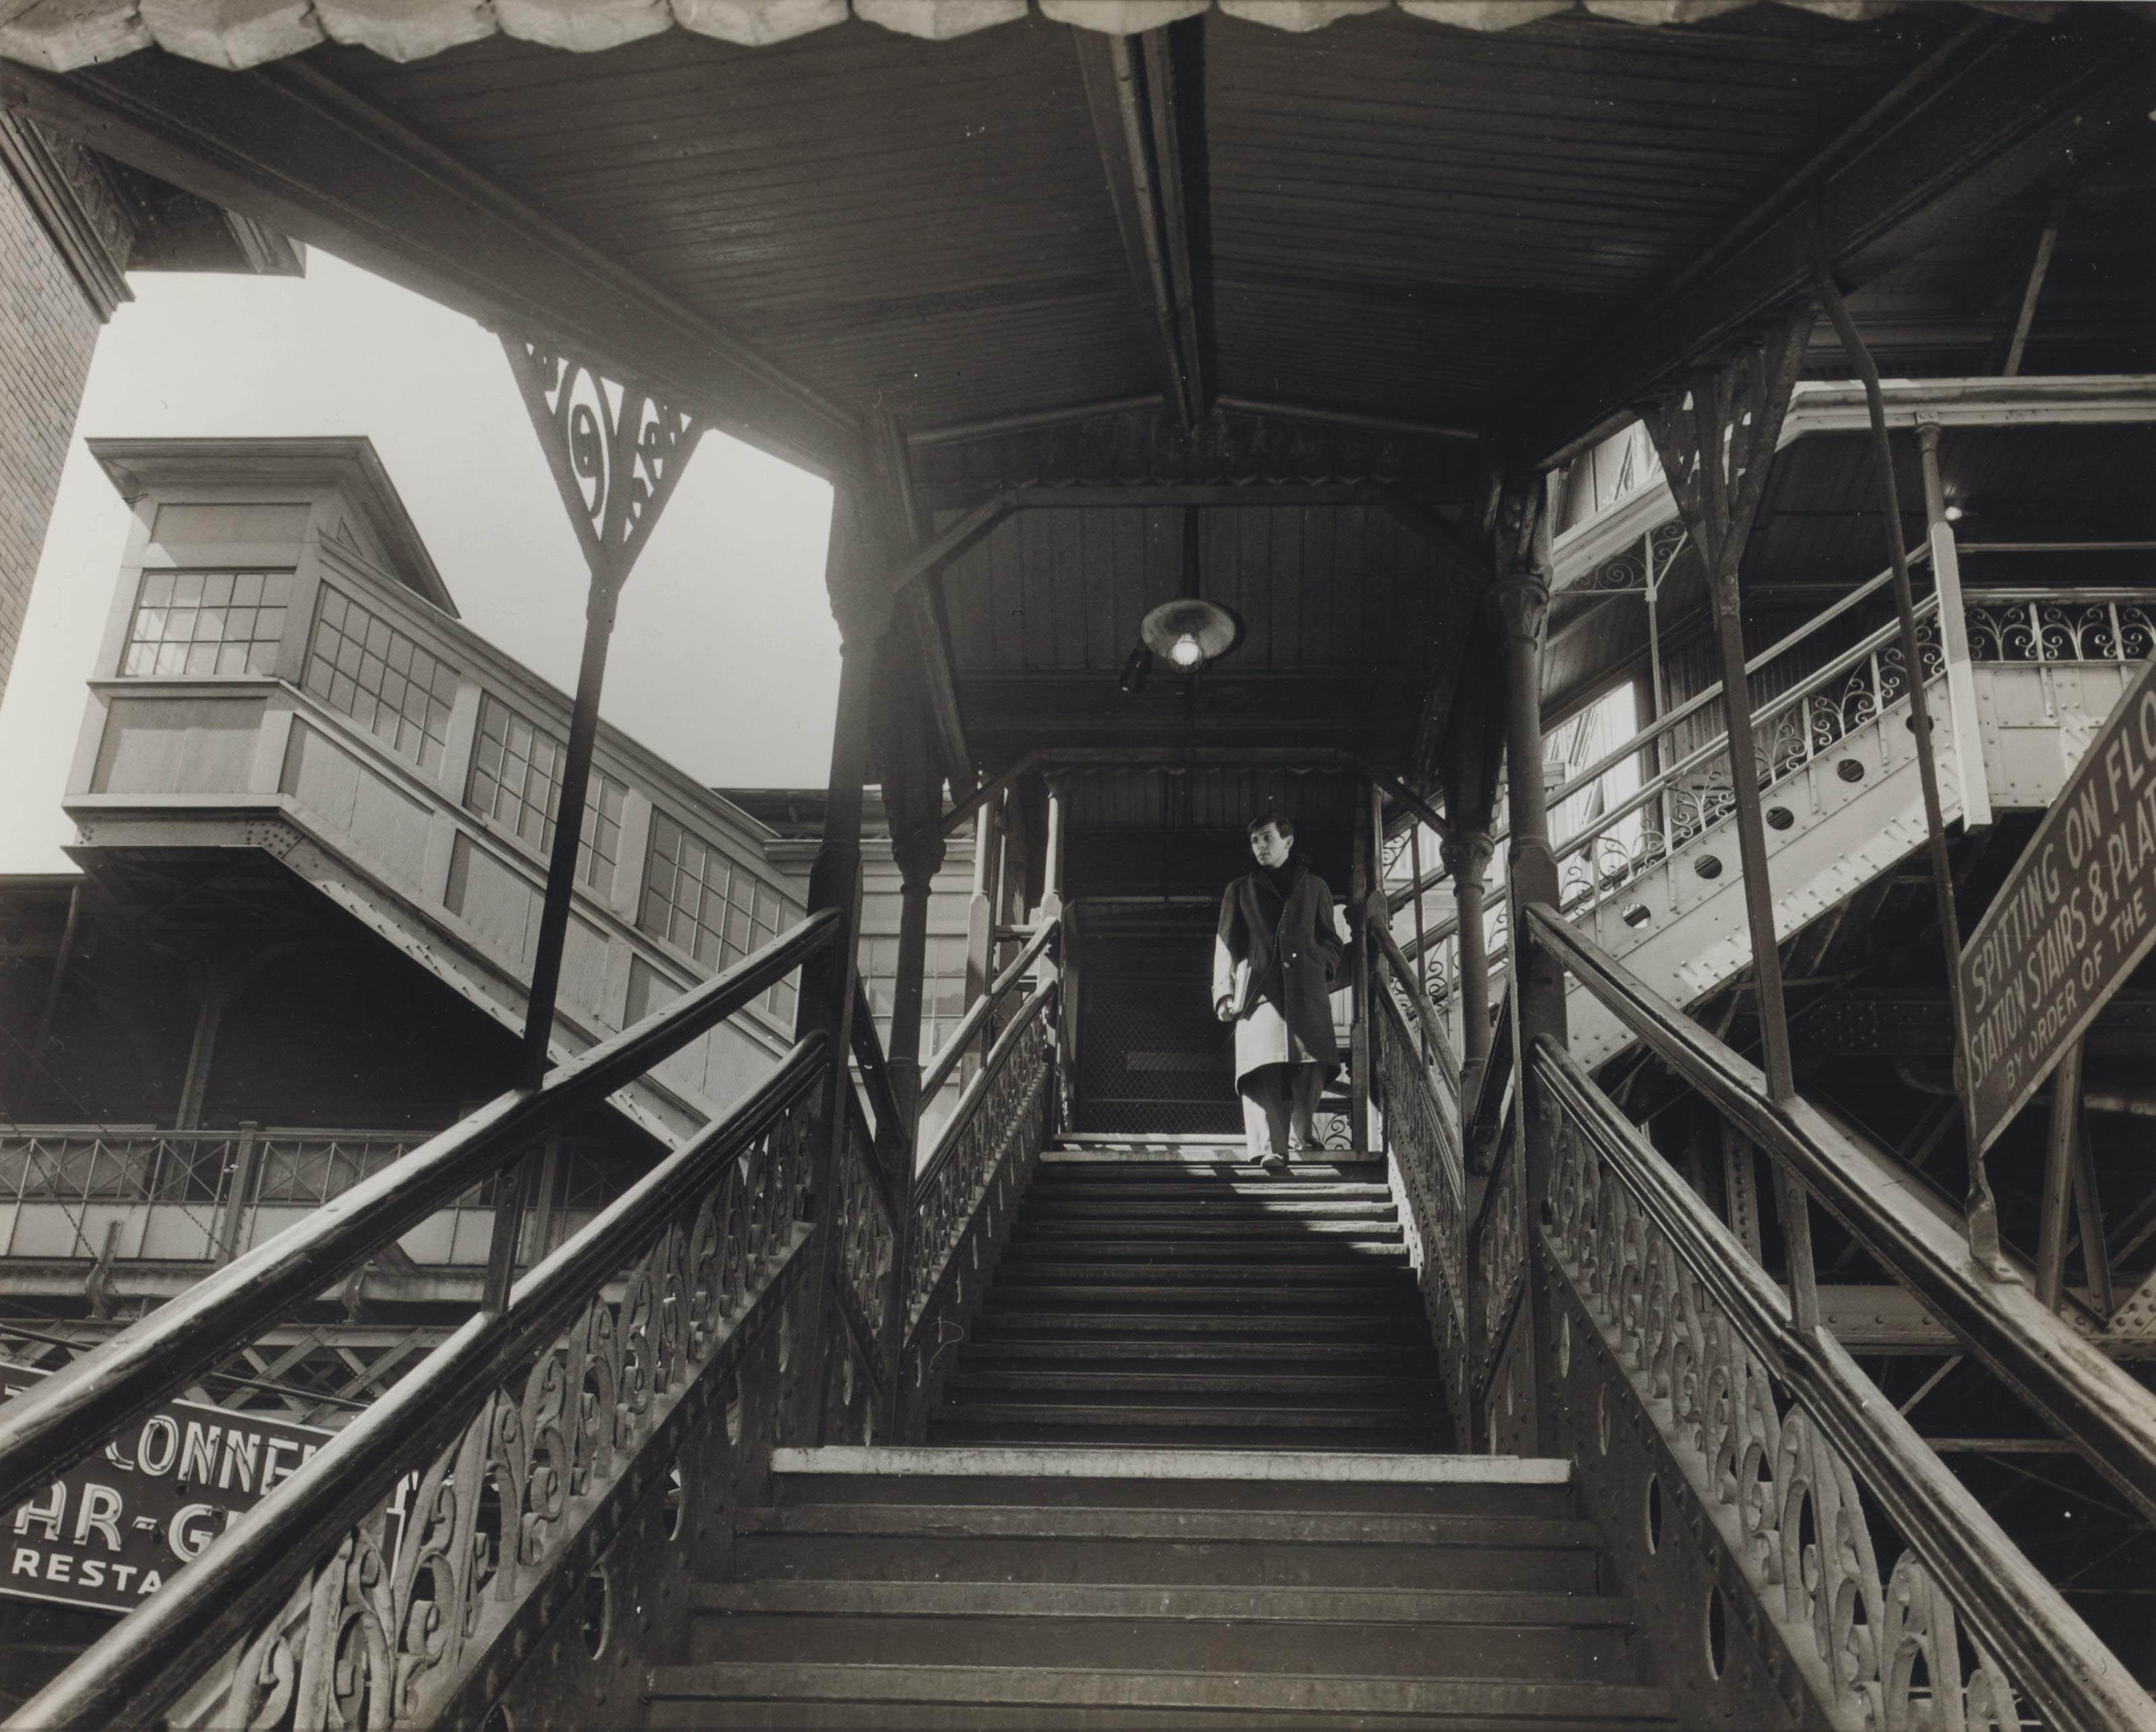 Third Avenue El, 23rd Street Station, 1950